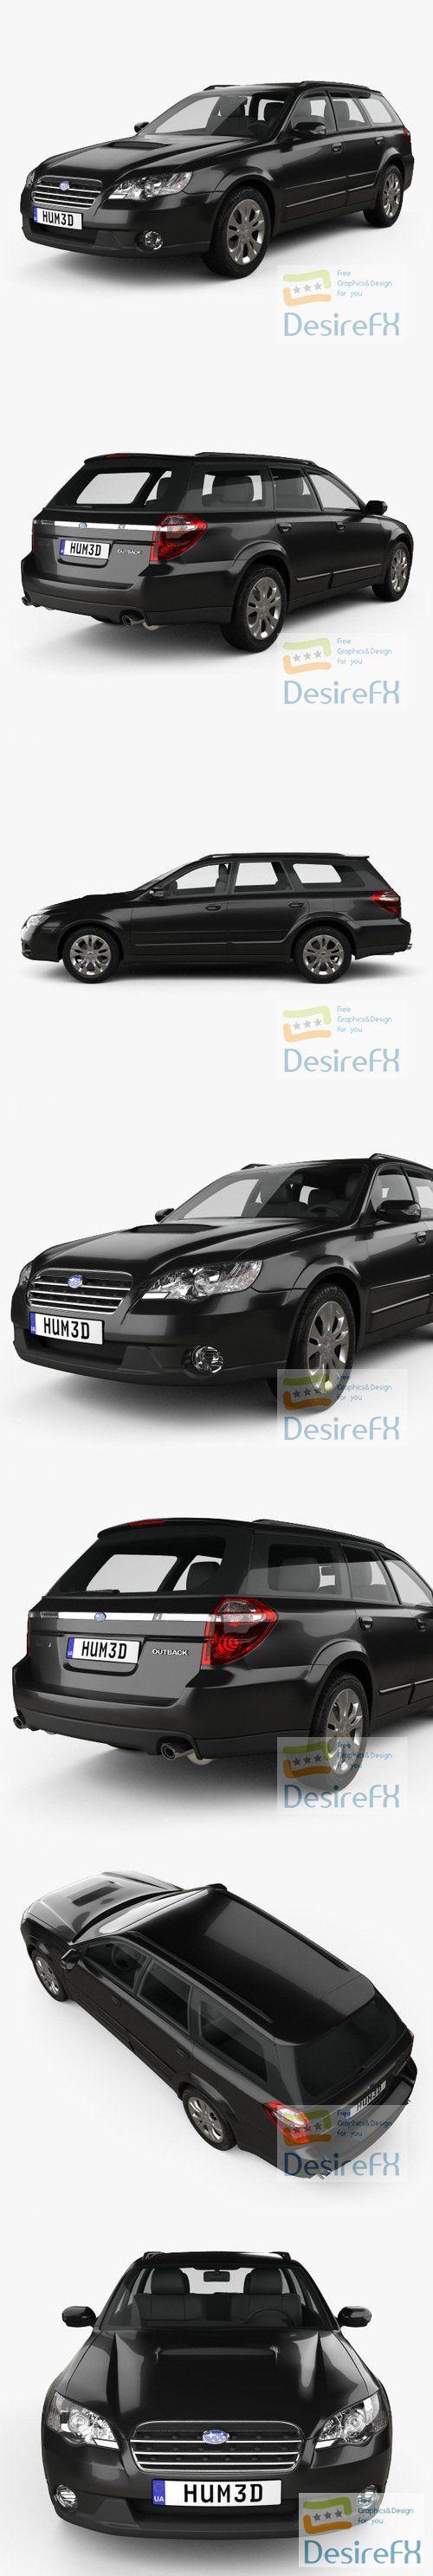 Subaru Outback 2008 3D Model